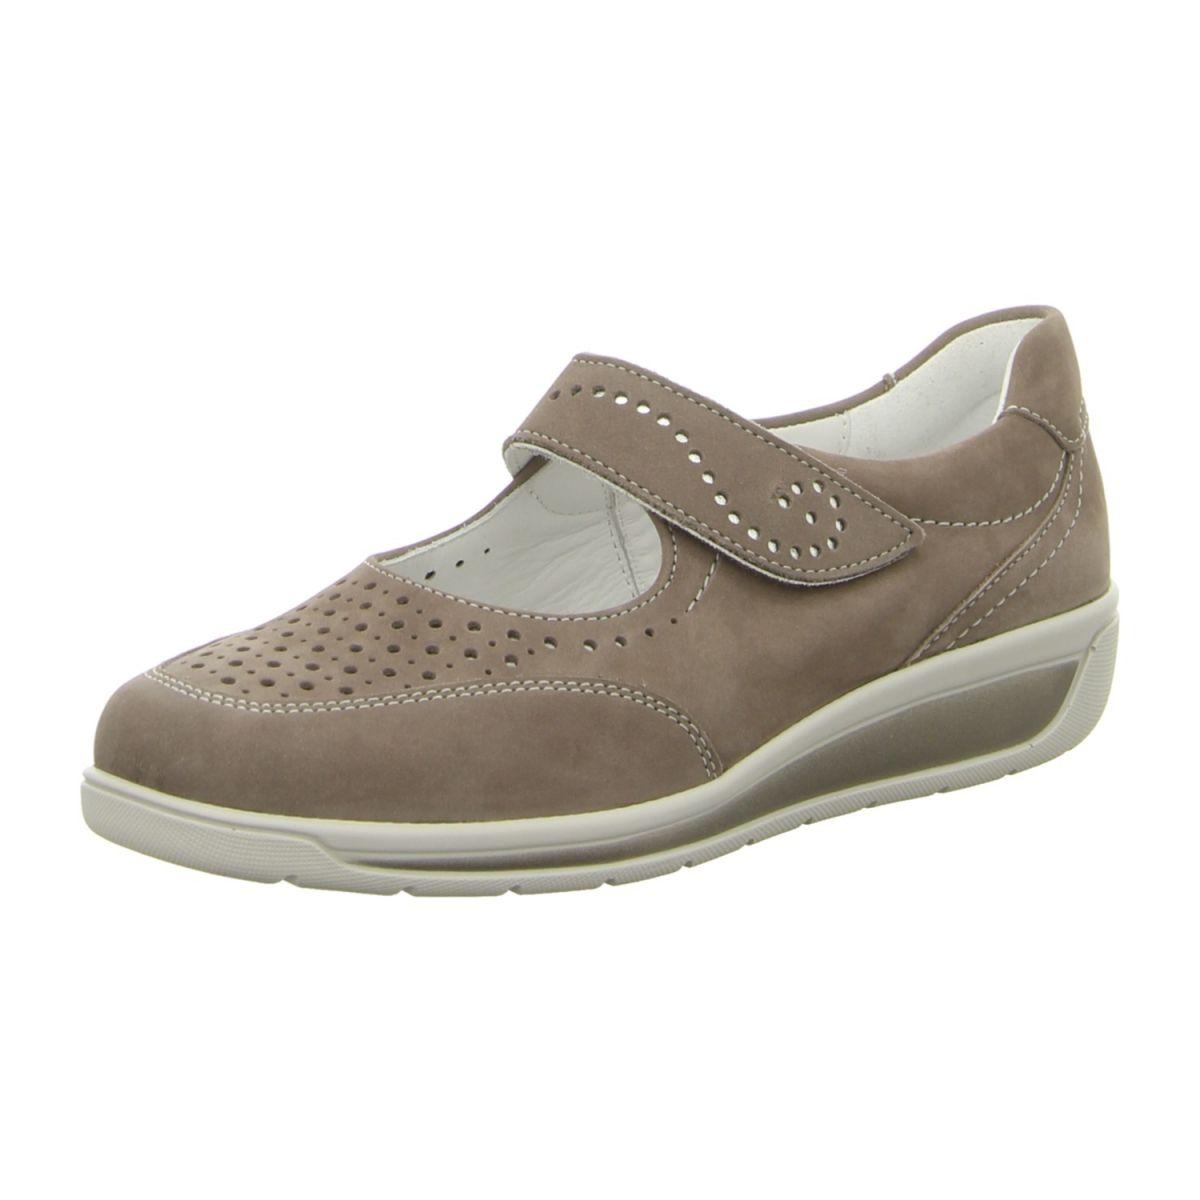 halbschuhe schnürschuhe ballerinas freizeitschuhe  ballerina flats shoes neu